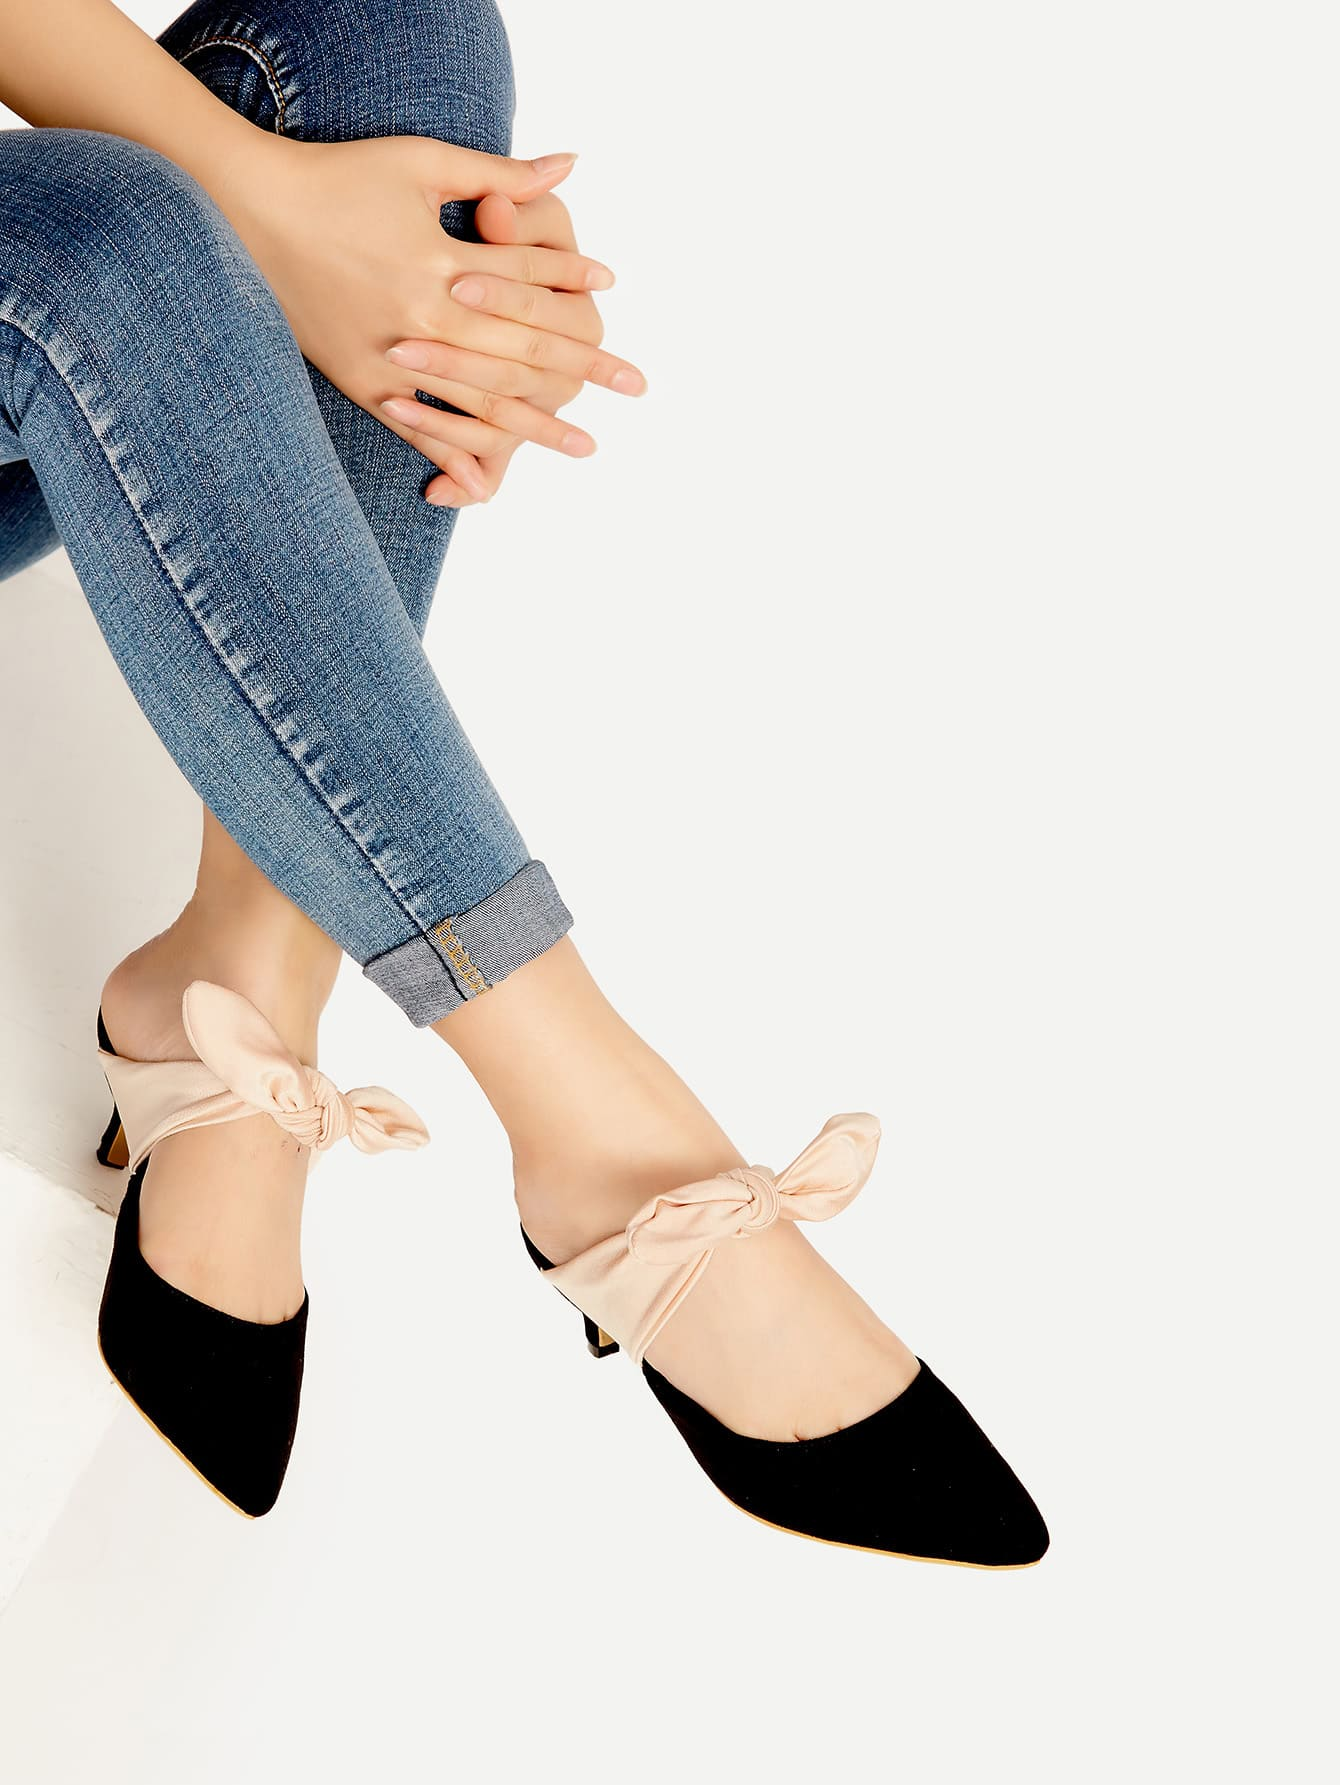 Sheinside Shoes Review